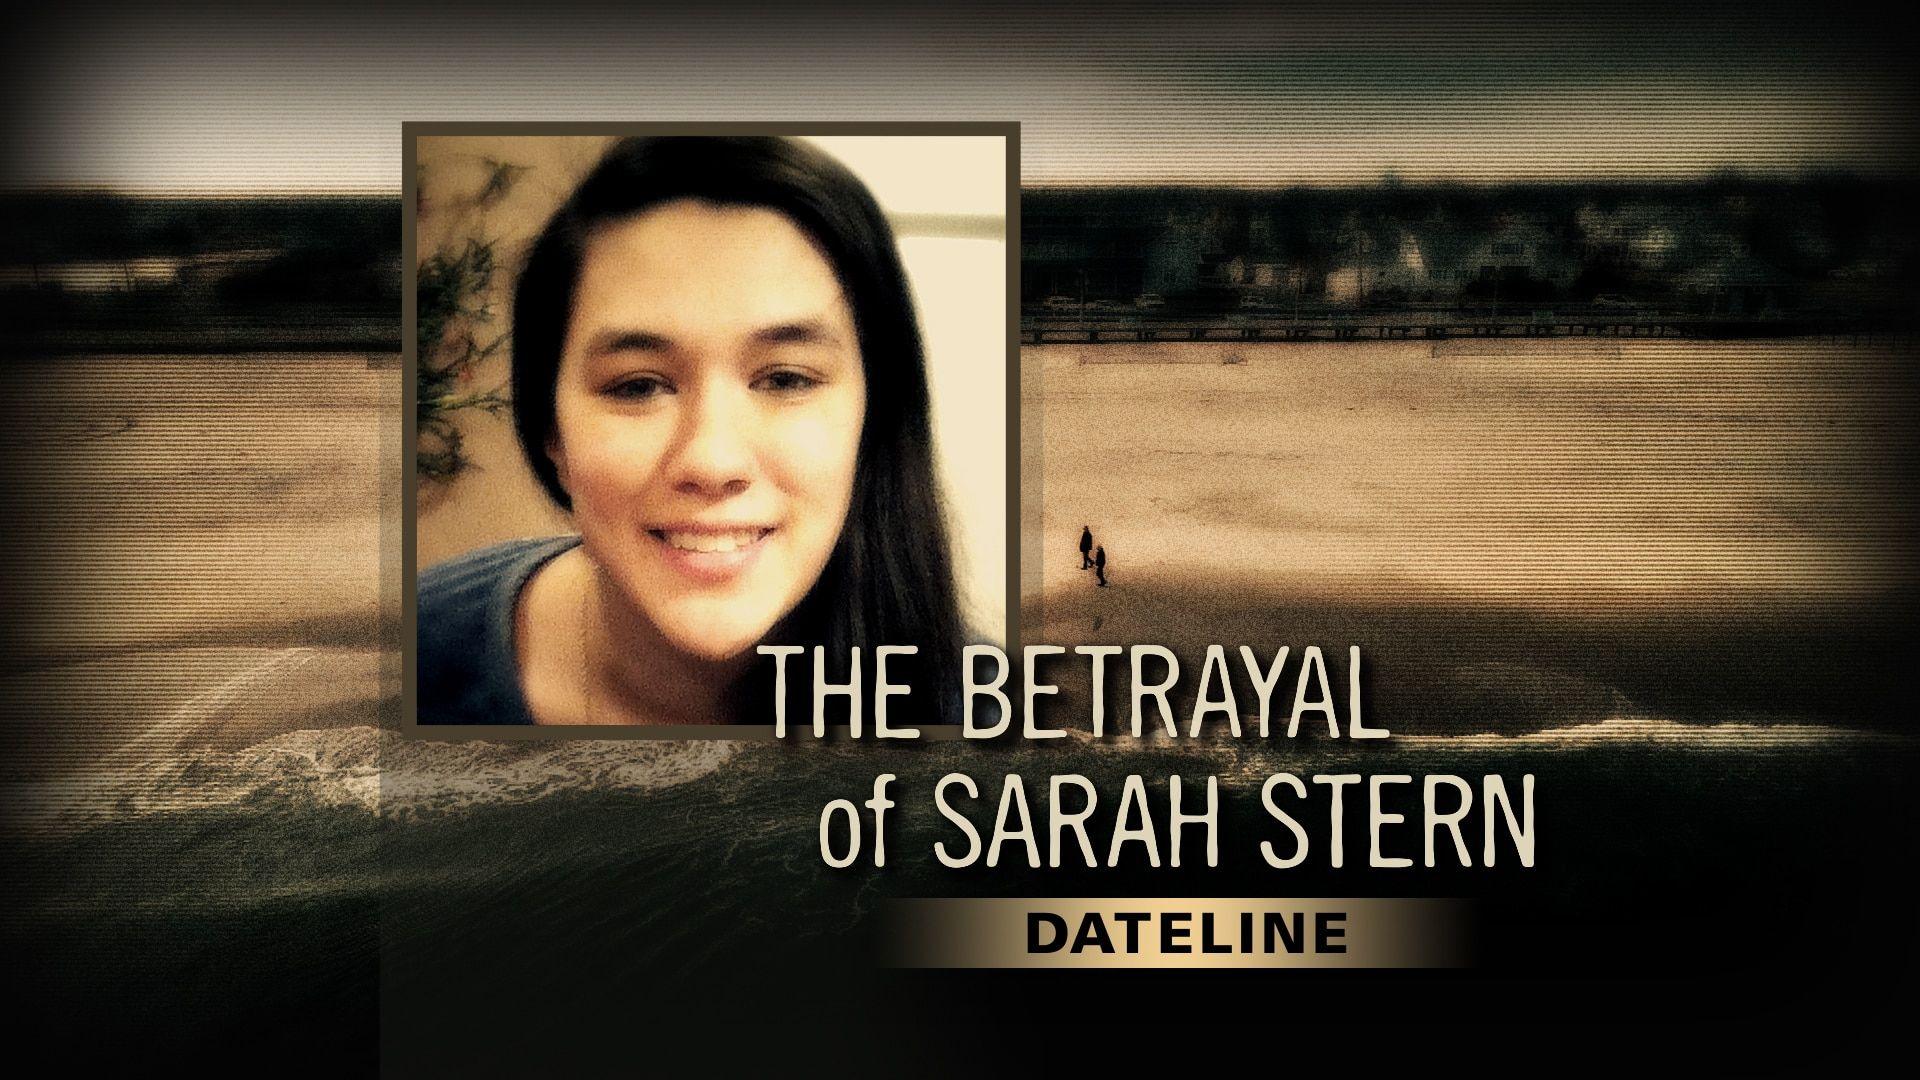 Watch Dateline Episode The Betrayal Of Sarah Stern Nbc Com Betrayal True Crime Episode